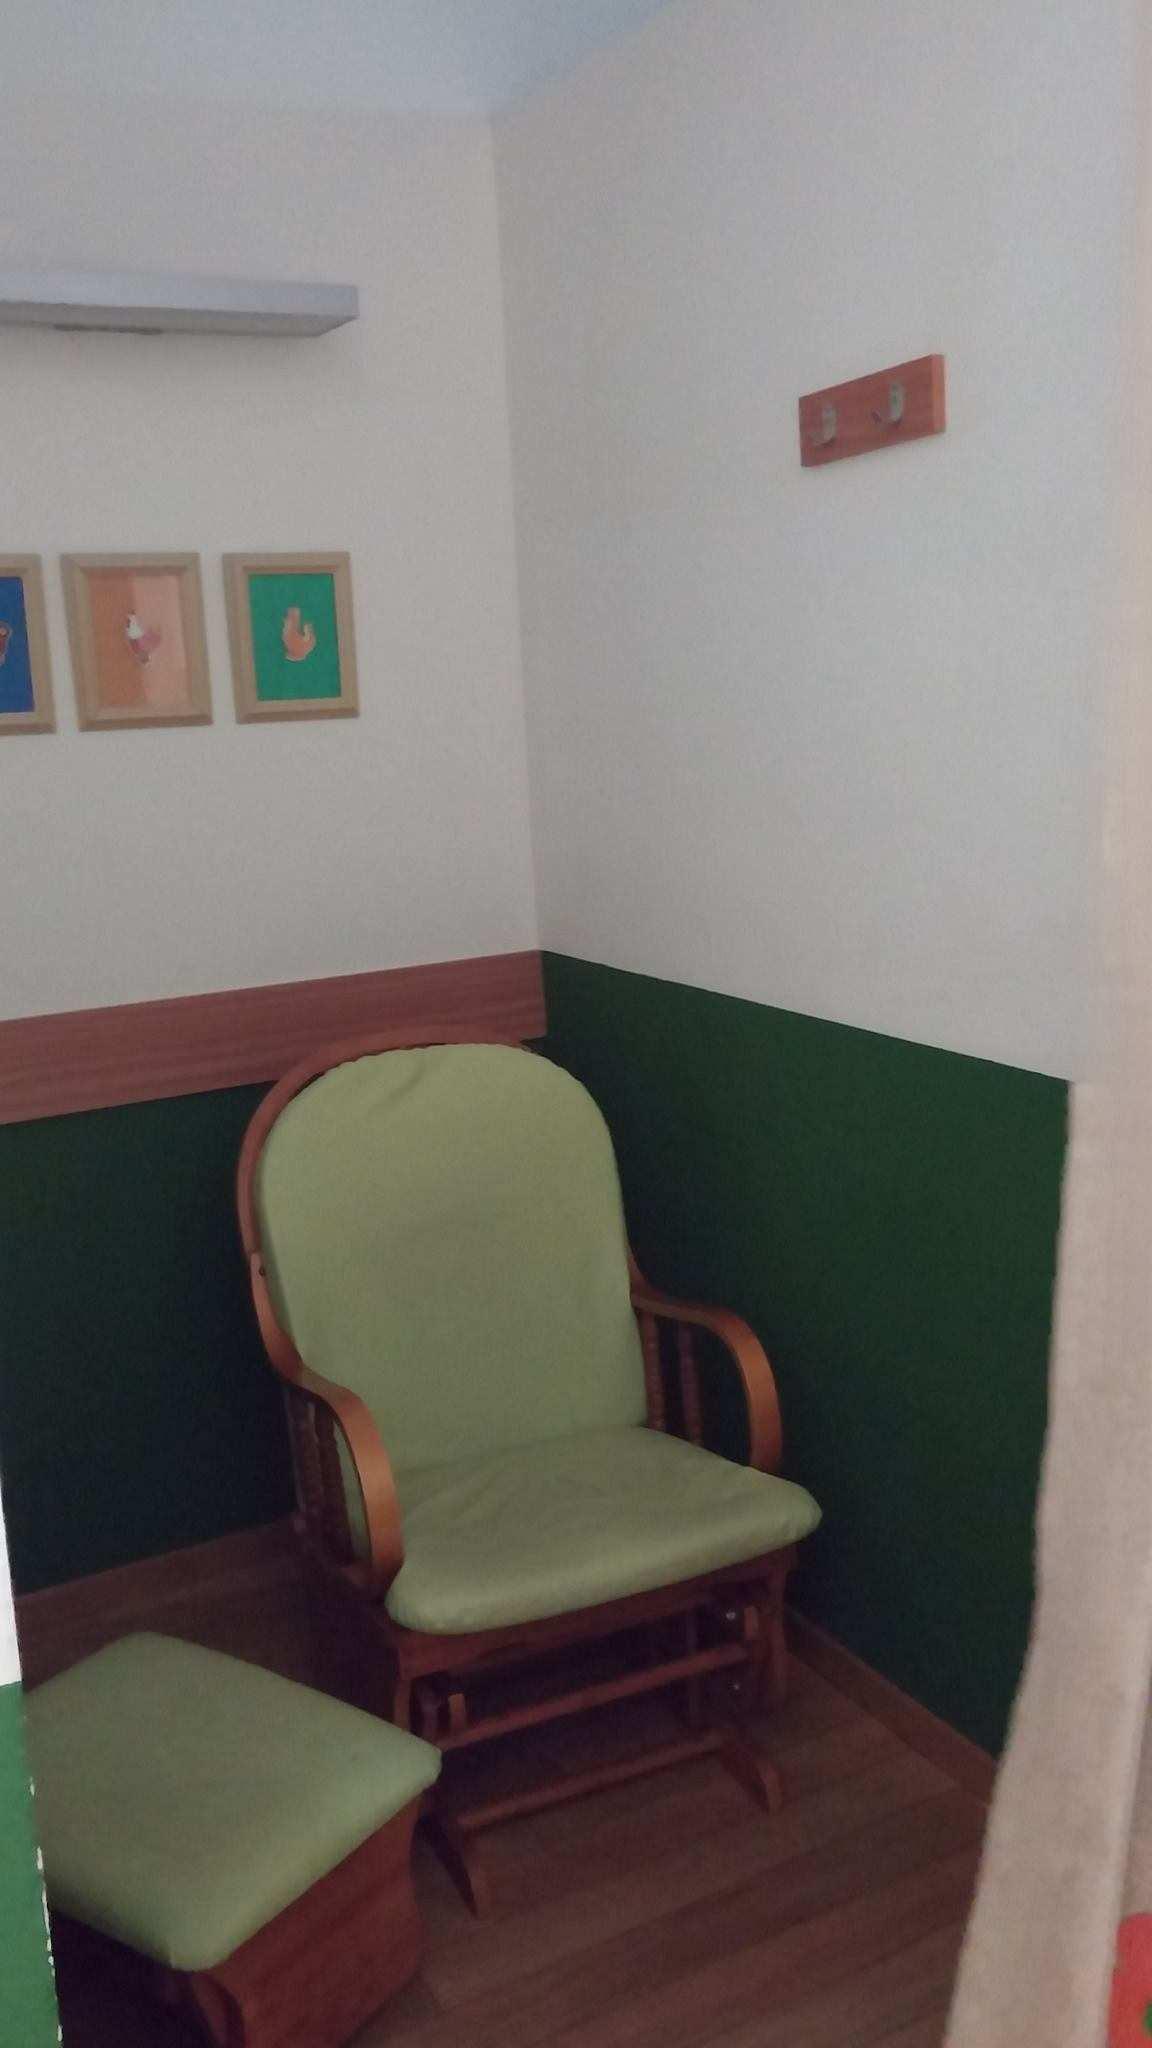 Tel Aviv Airport Nursing mothers room pic2